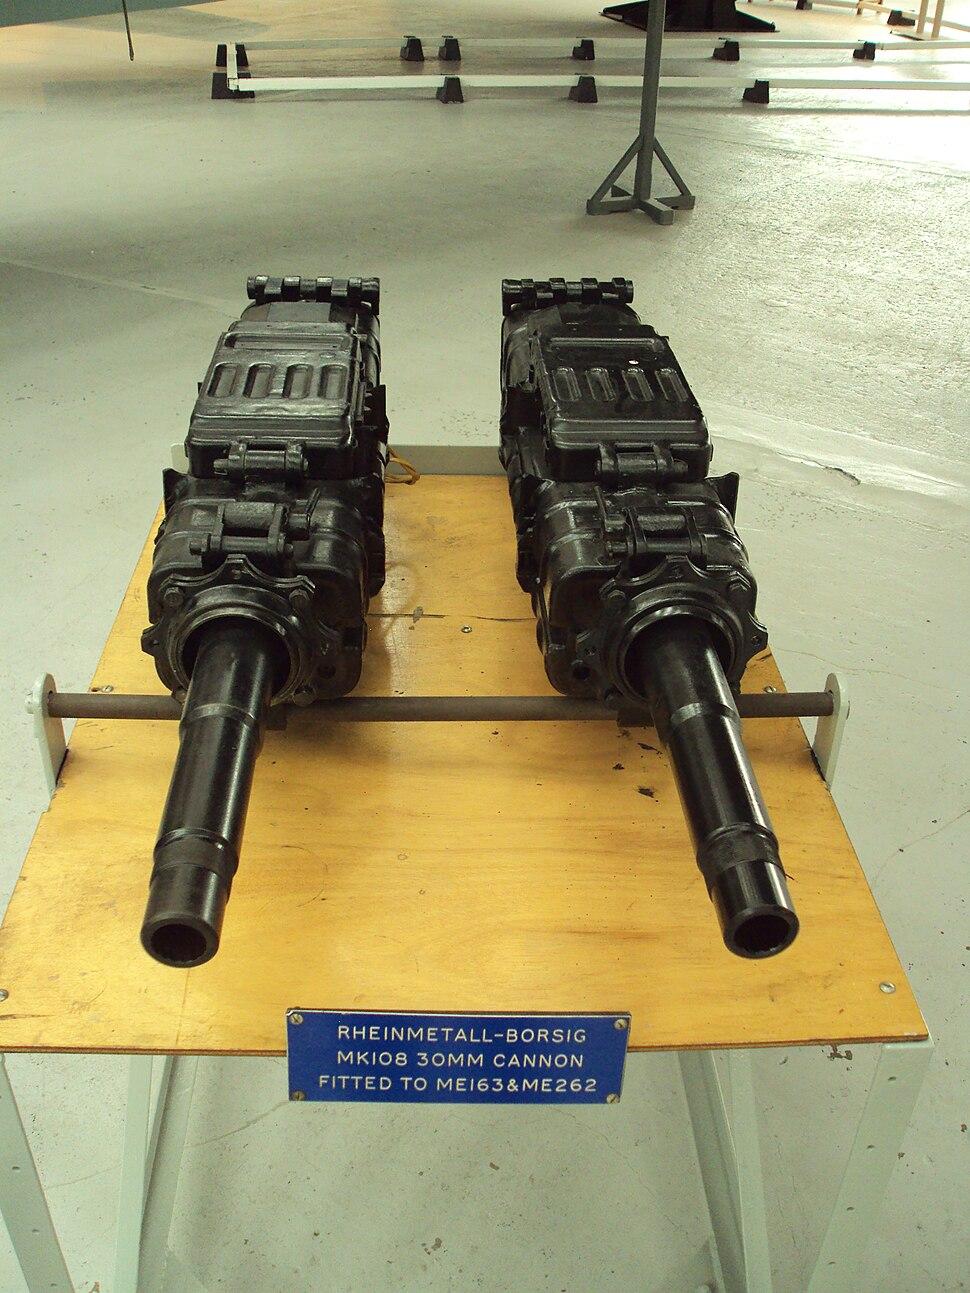 MK 108 at RAF Museum Cosford